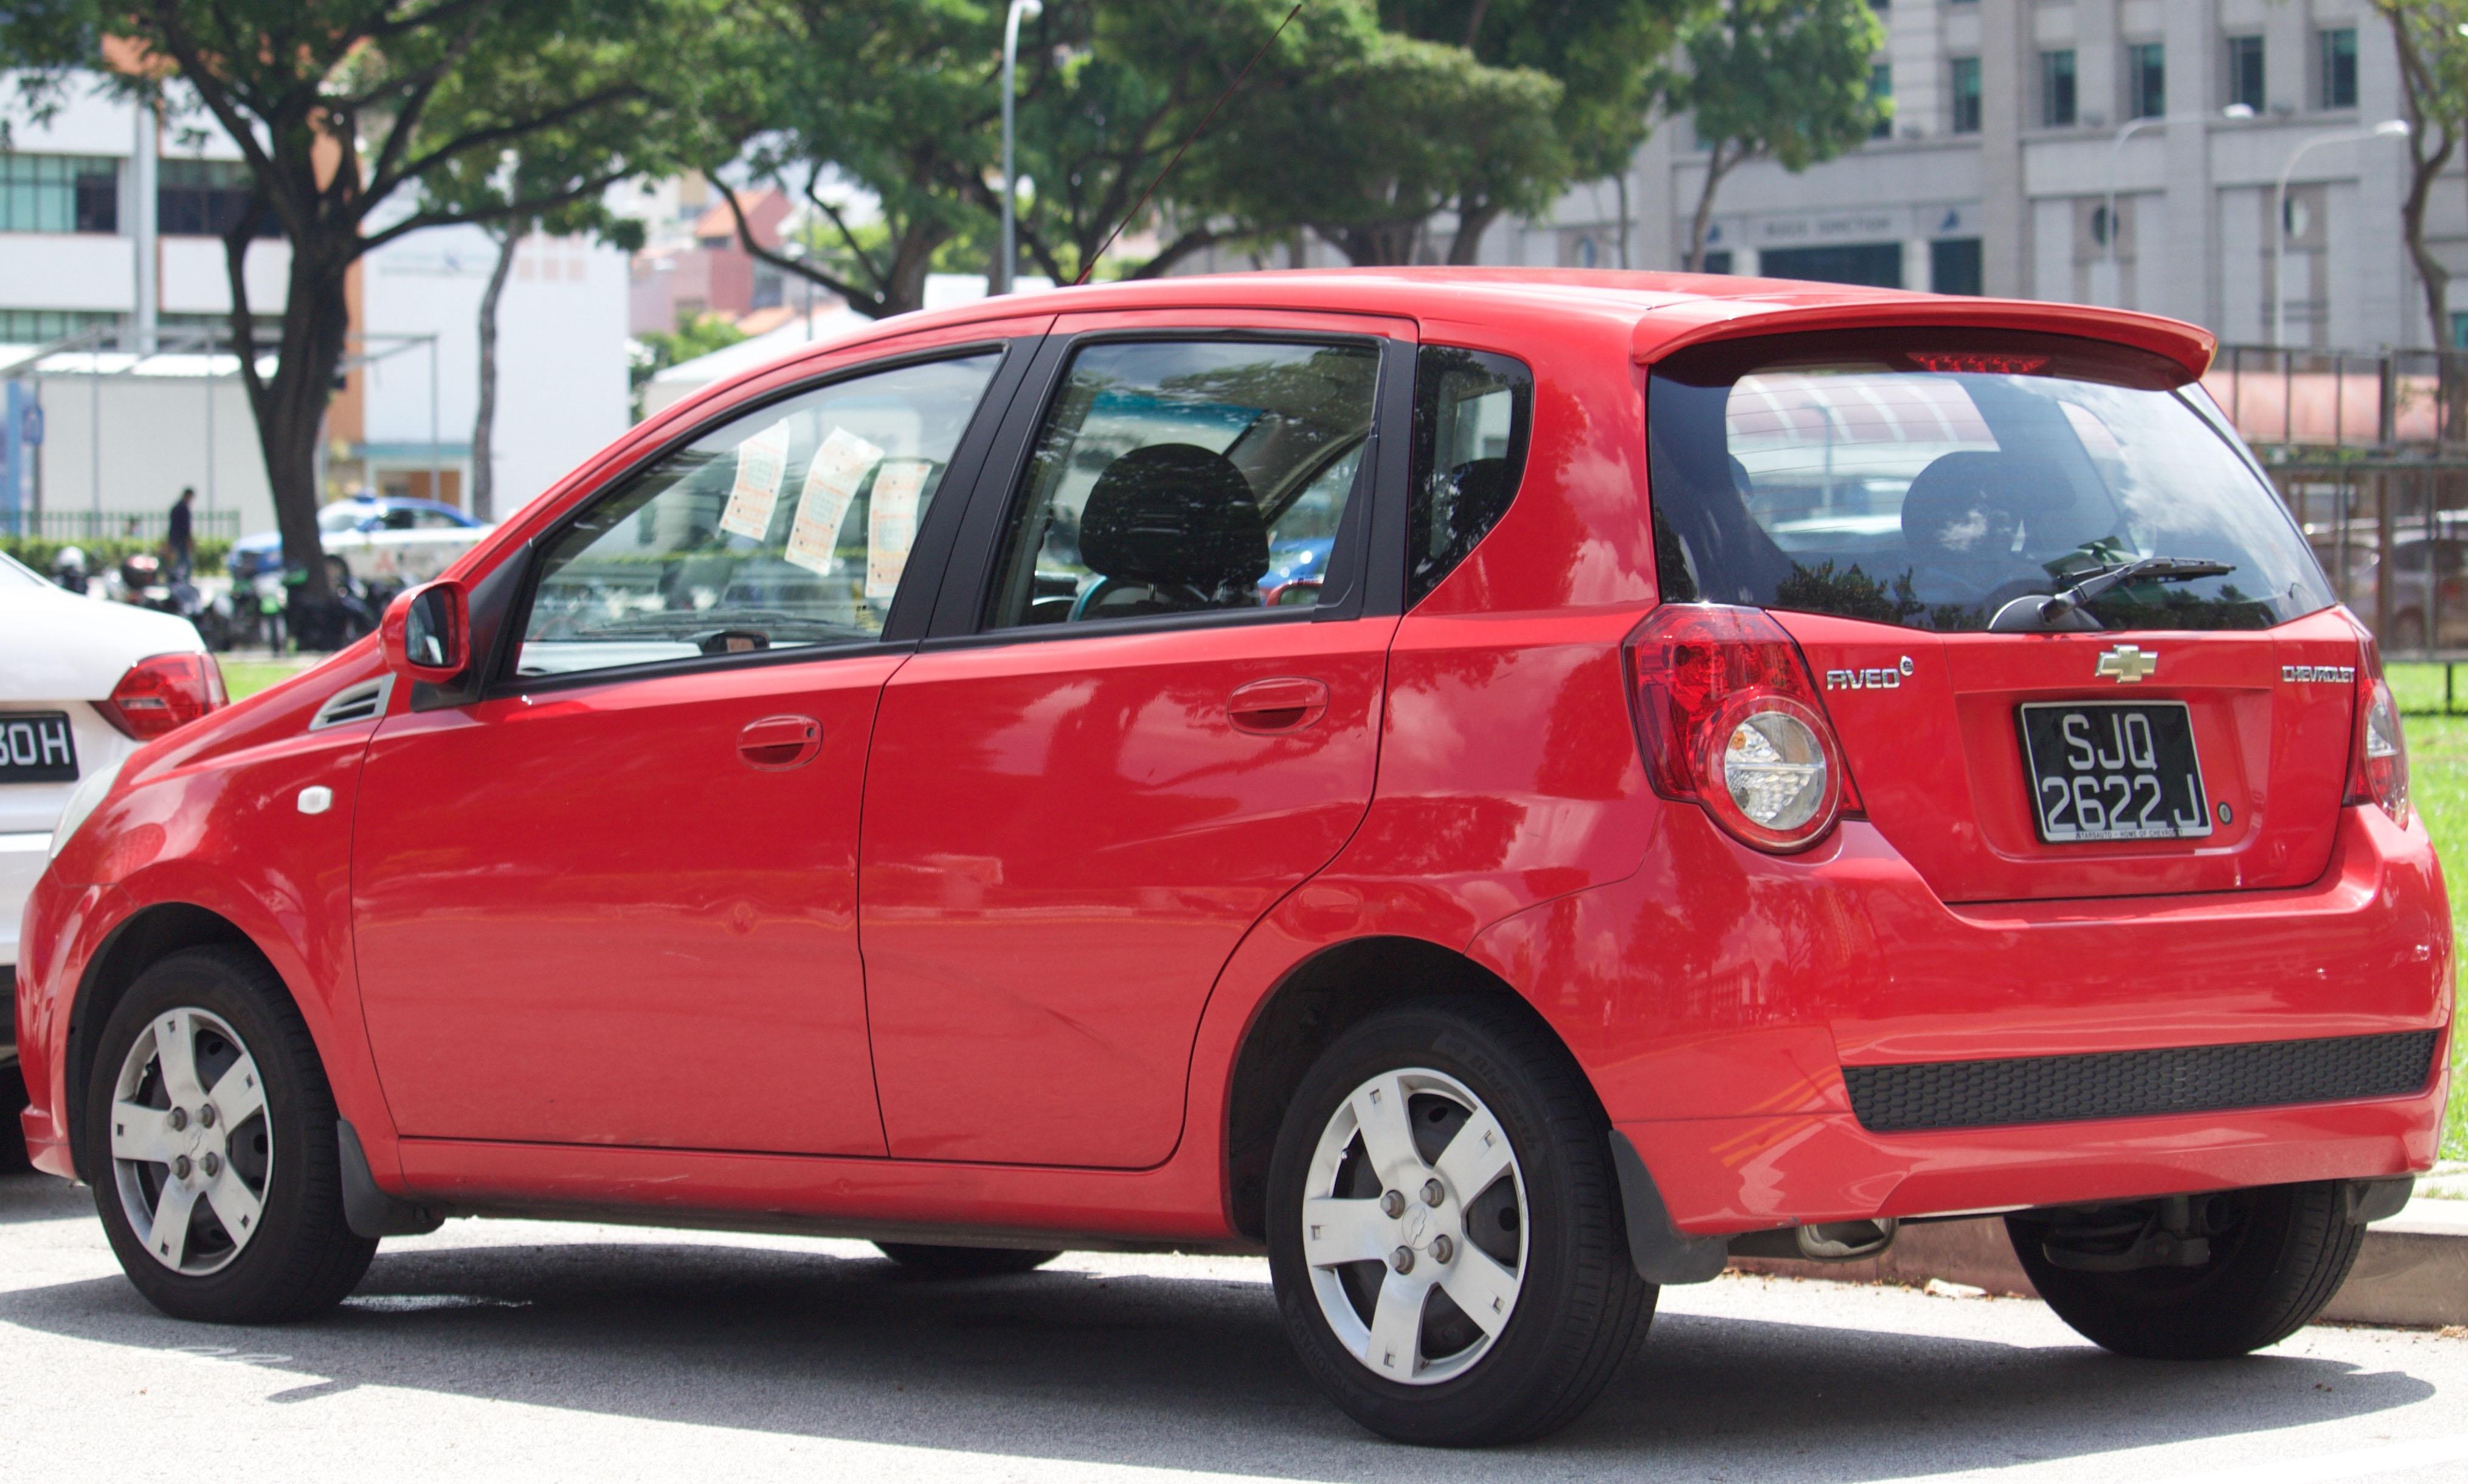 File 2009 Chevrolet Aveo T250 1 4 Hatchback 2016 01 07